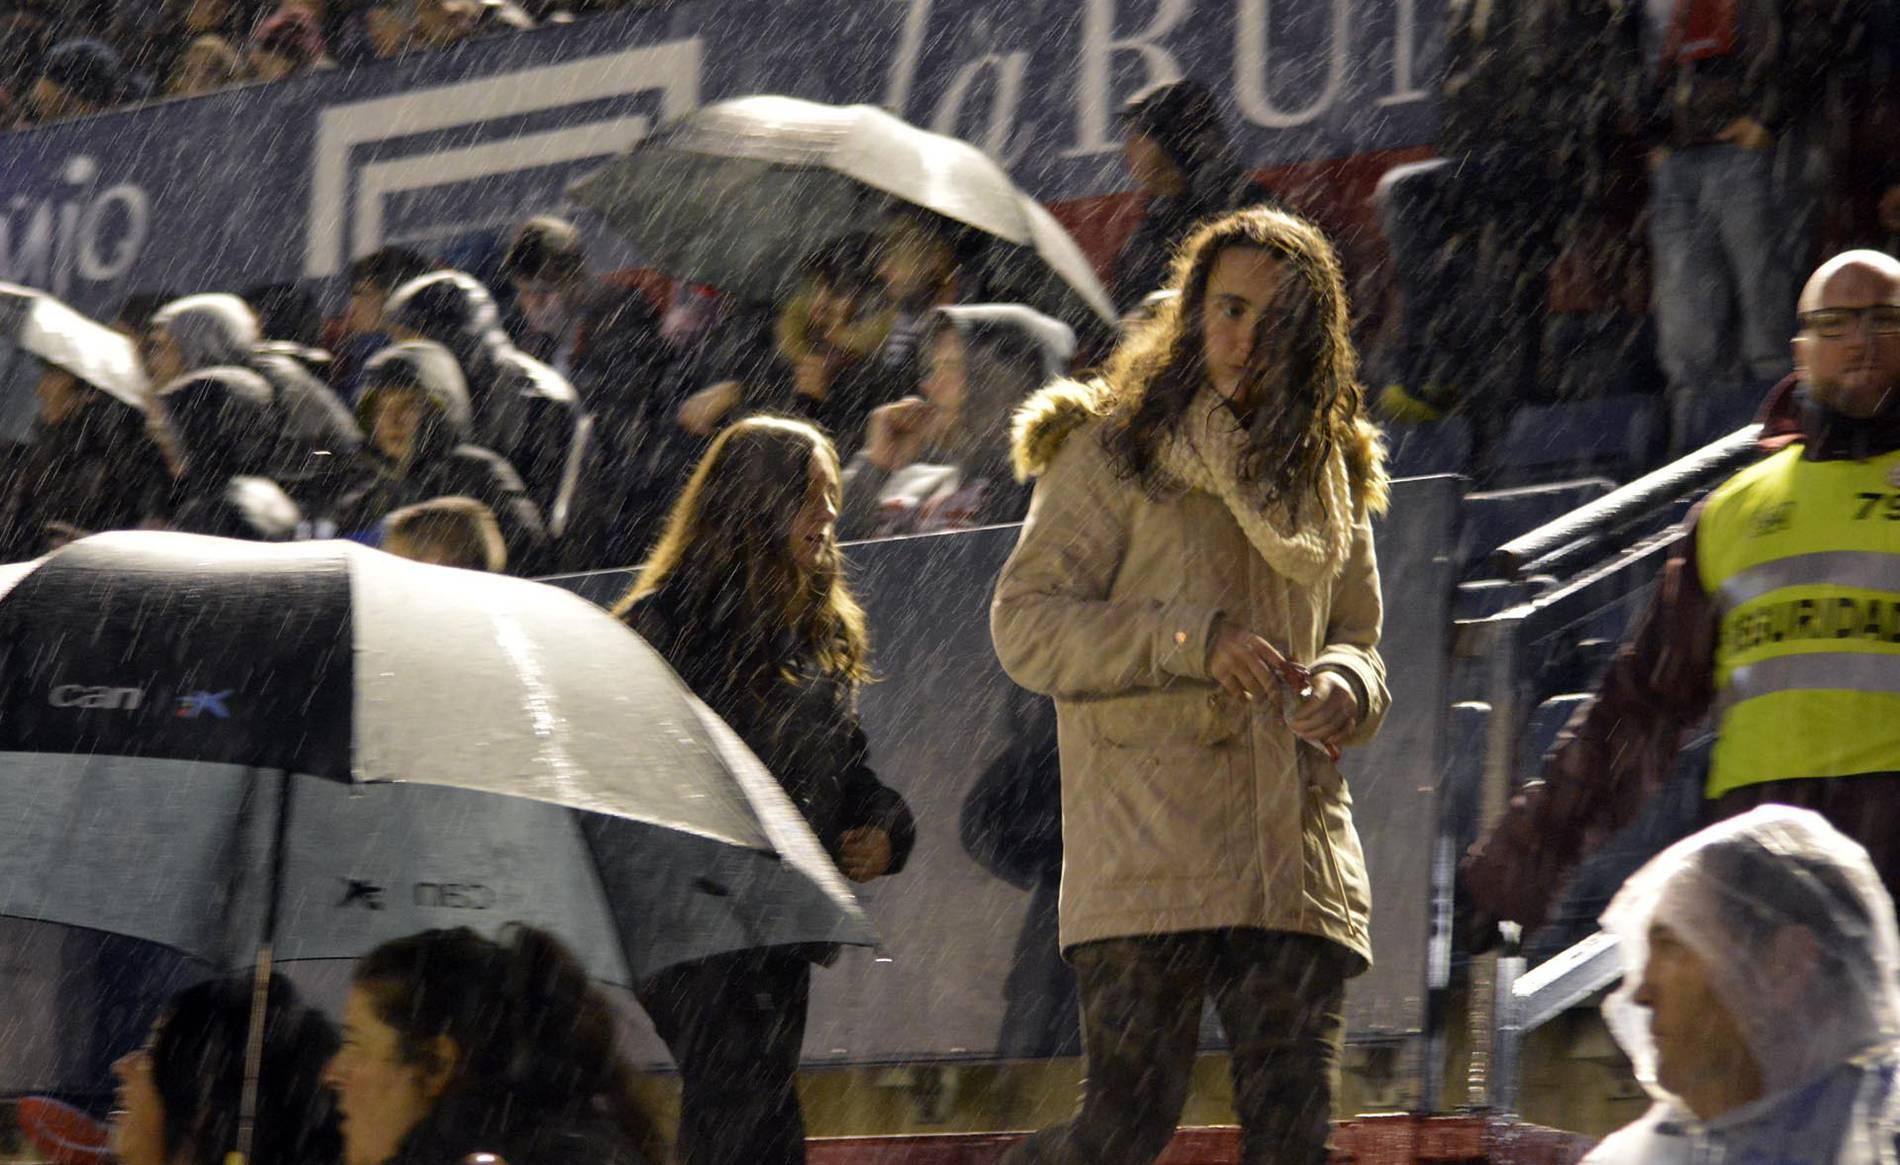 Búscate en la grada del Osasuna - Granada (II) (1/26) - Búscate en la grada del Osasuna - Granada (II) - Osasuna -